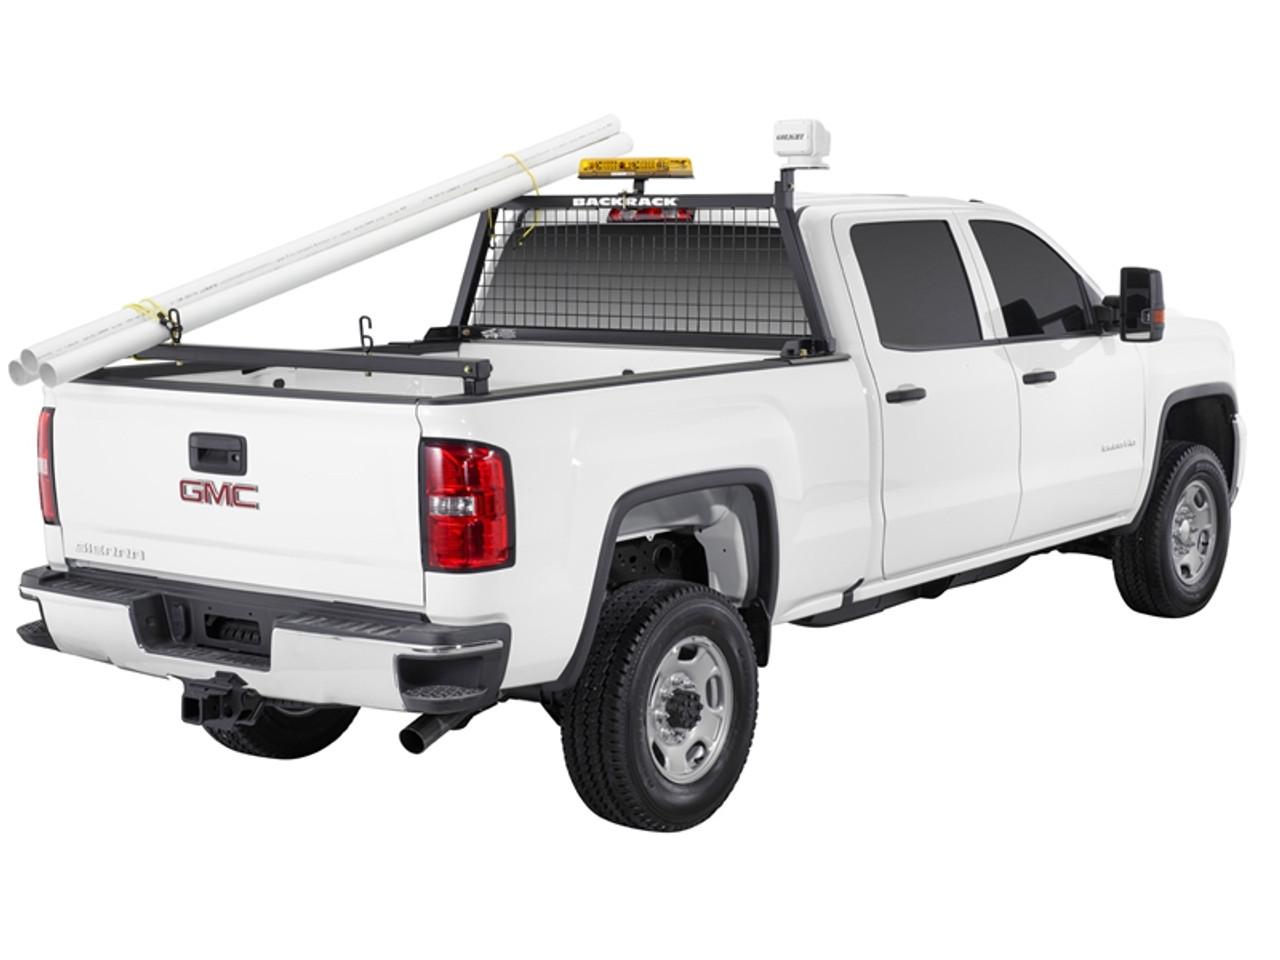 https leonardaccessories com product backrack truck bed rear bar headache racks